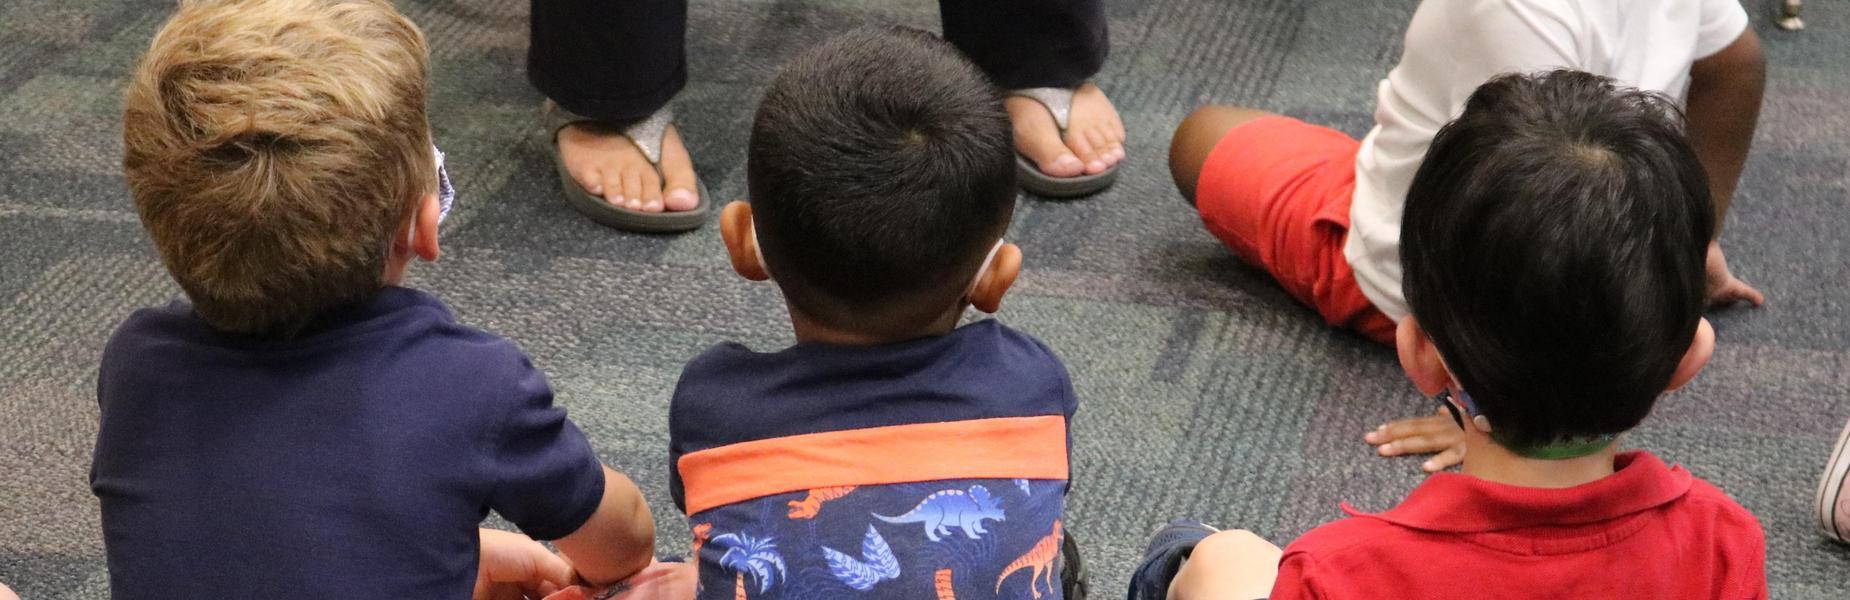 Preschoolers enjoy listening to a story during an Extended School Year (ESY) program in Westfield Public Schools.